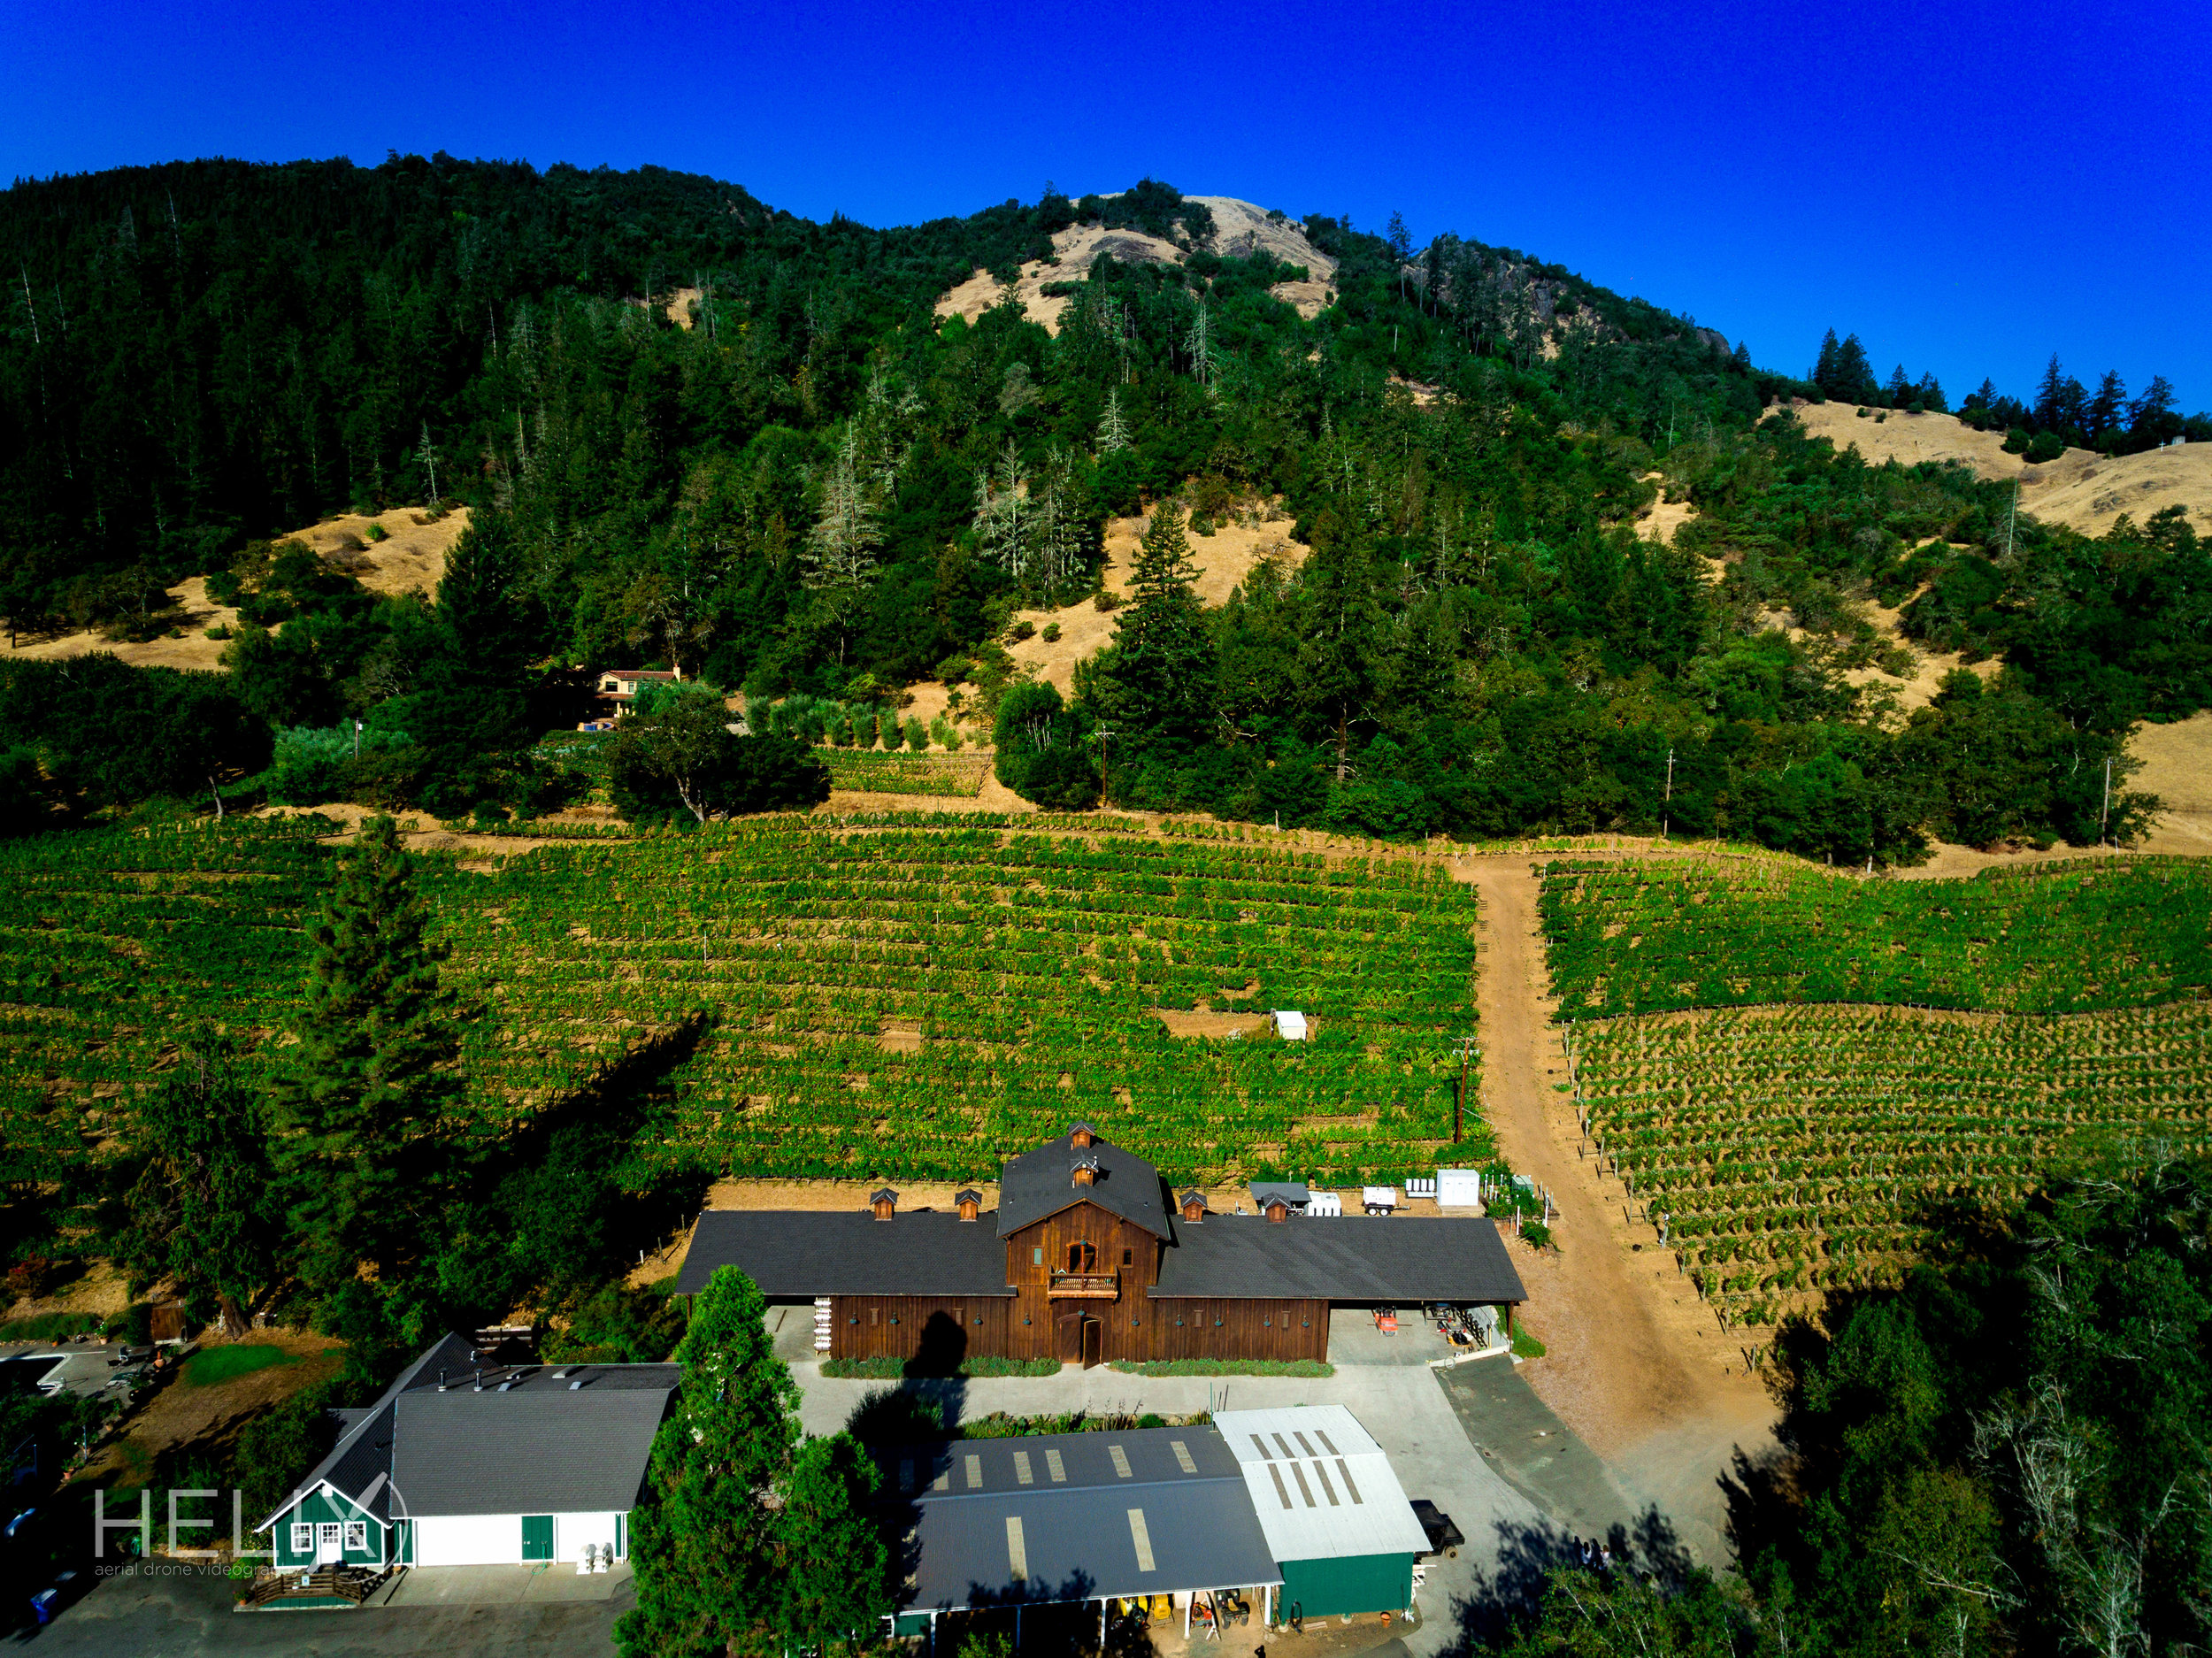 HELIX - Jerico Canyon Winery 090516-1.jpg